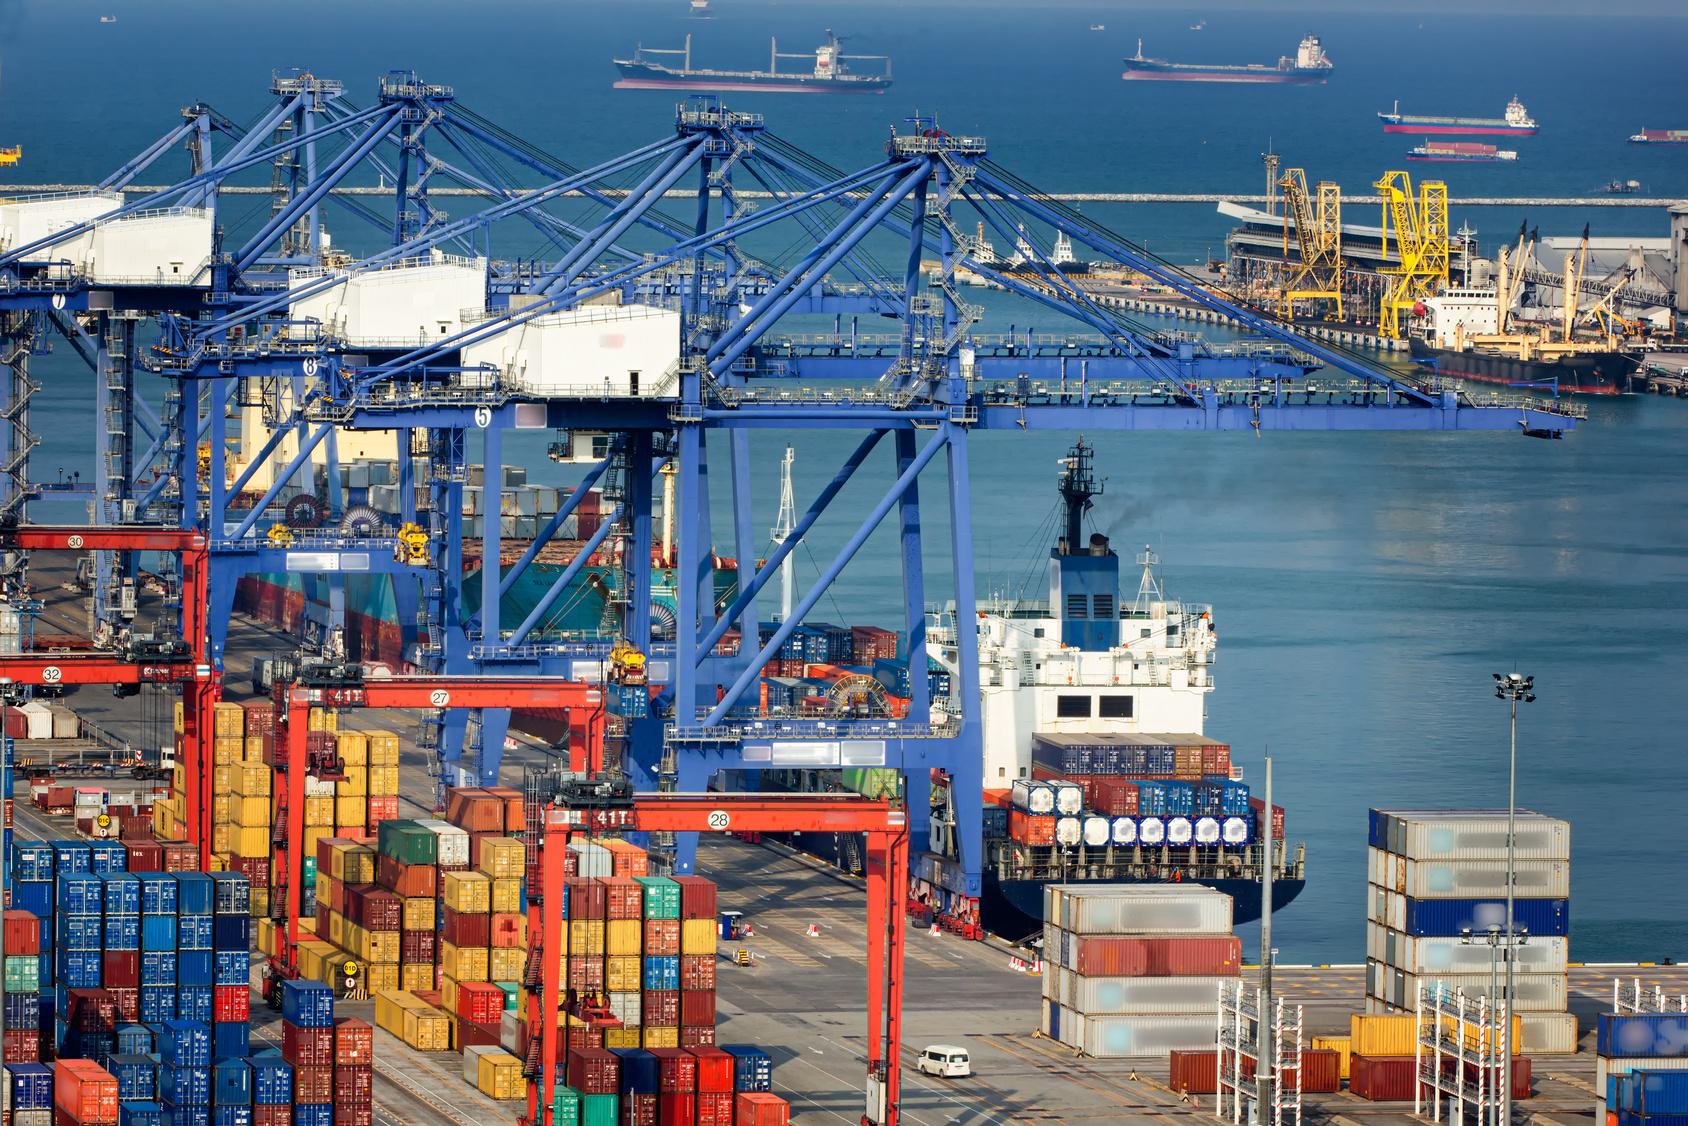 supply chain transport - Photo : Anekoho / Fotolia.com